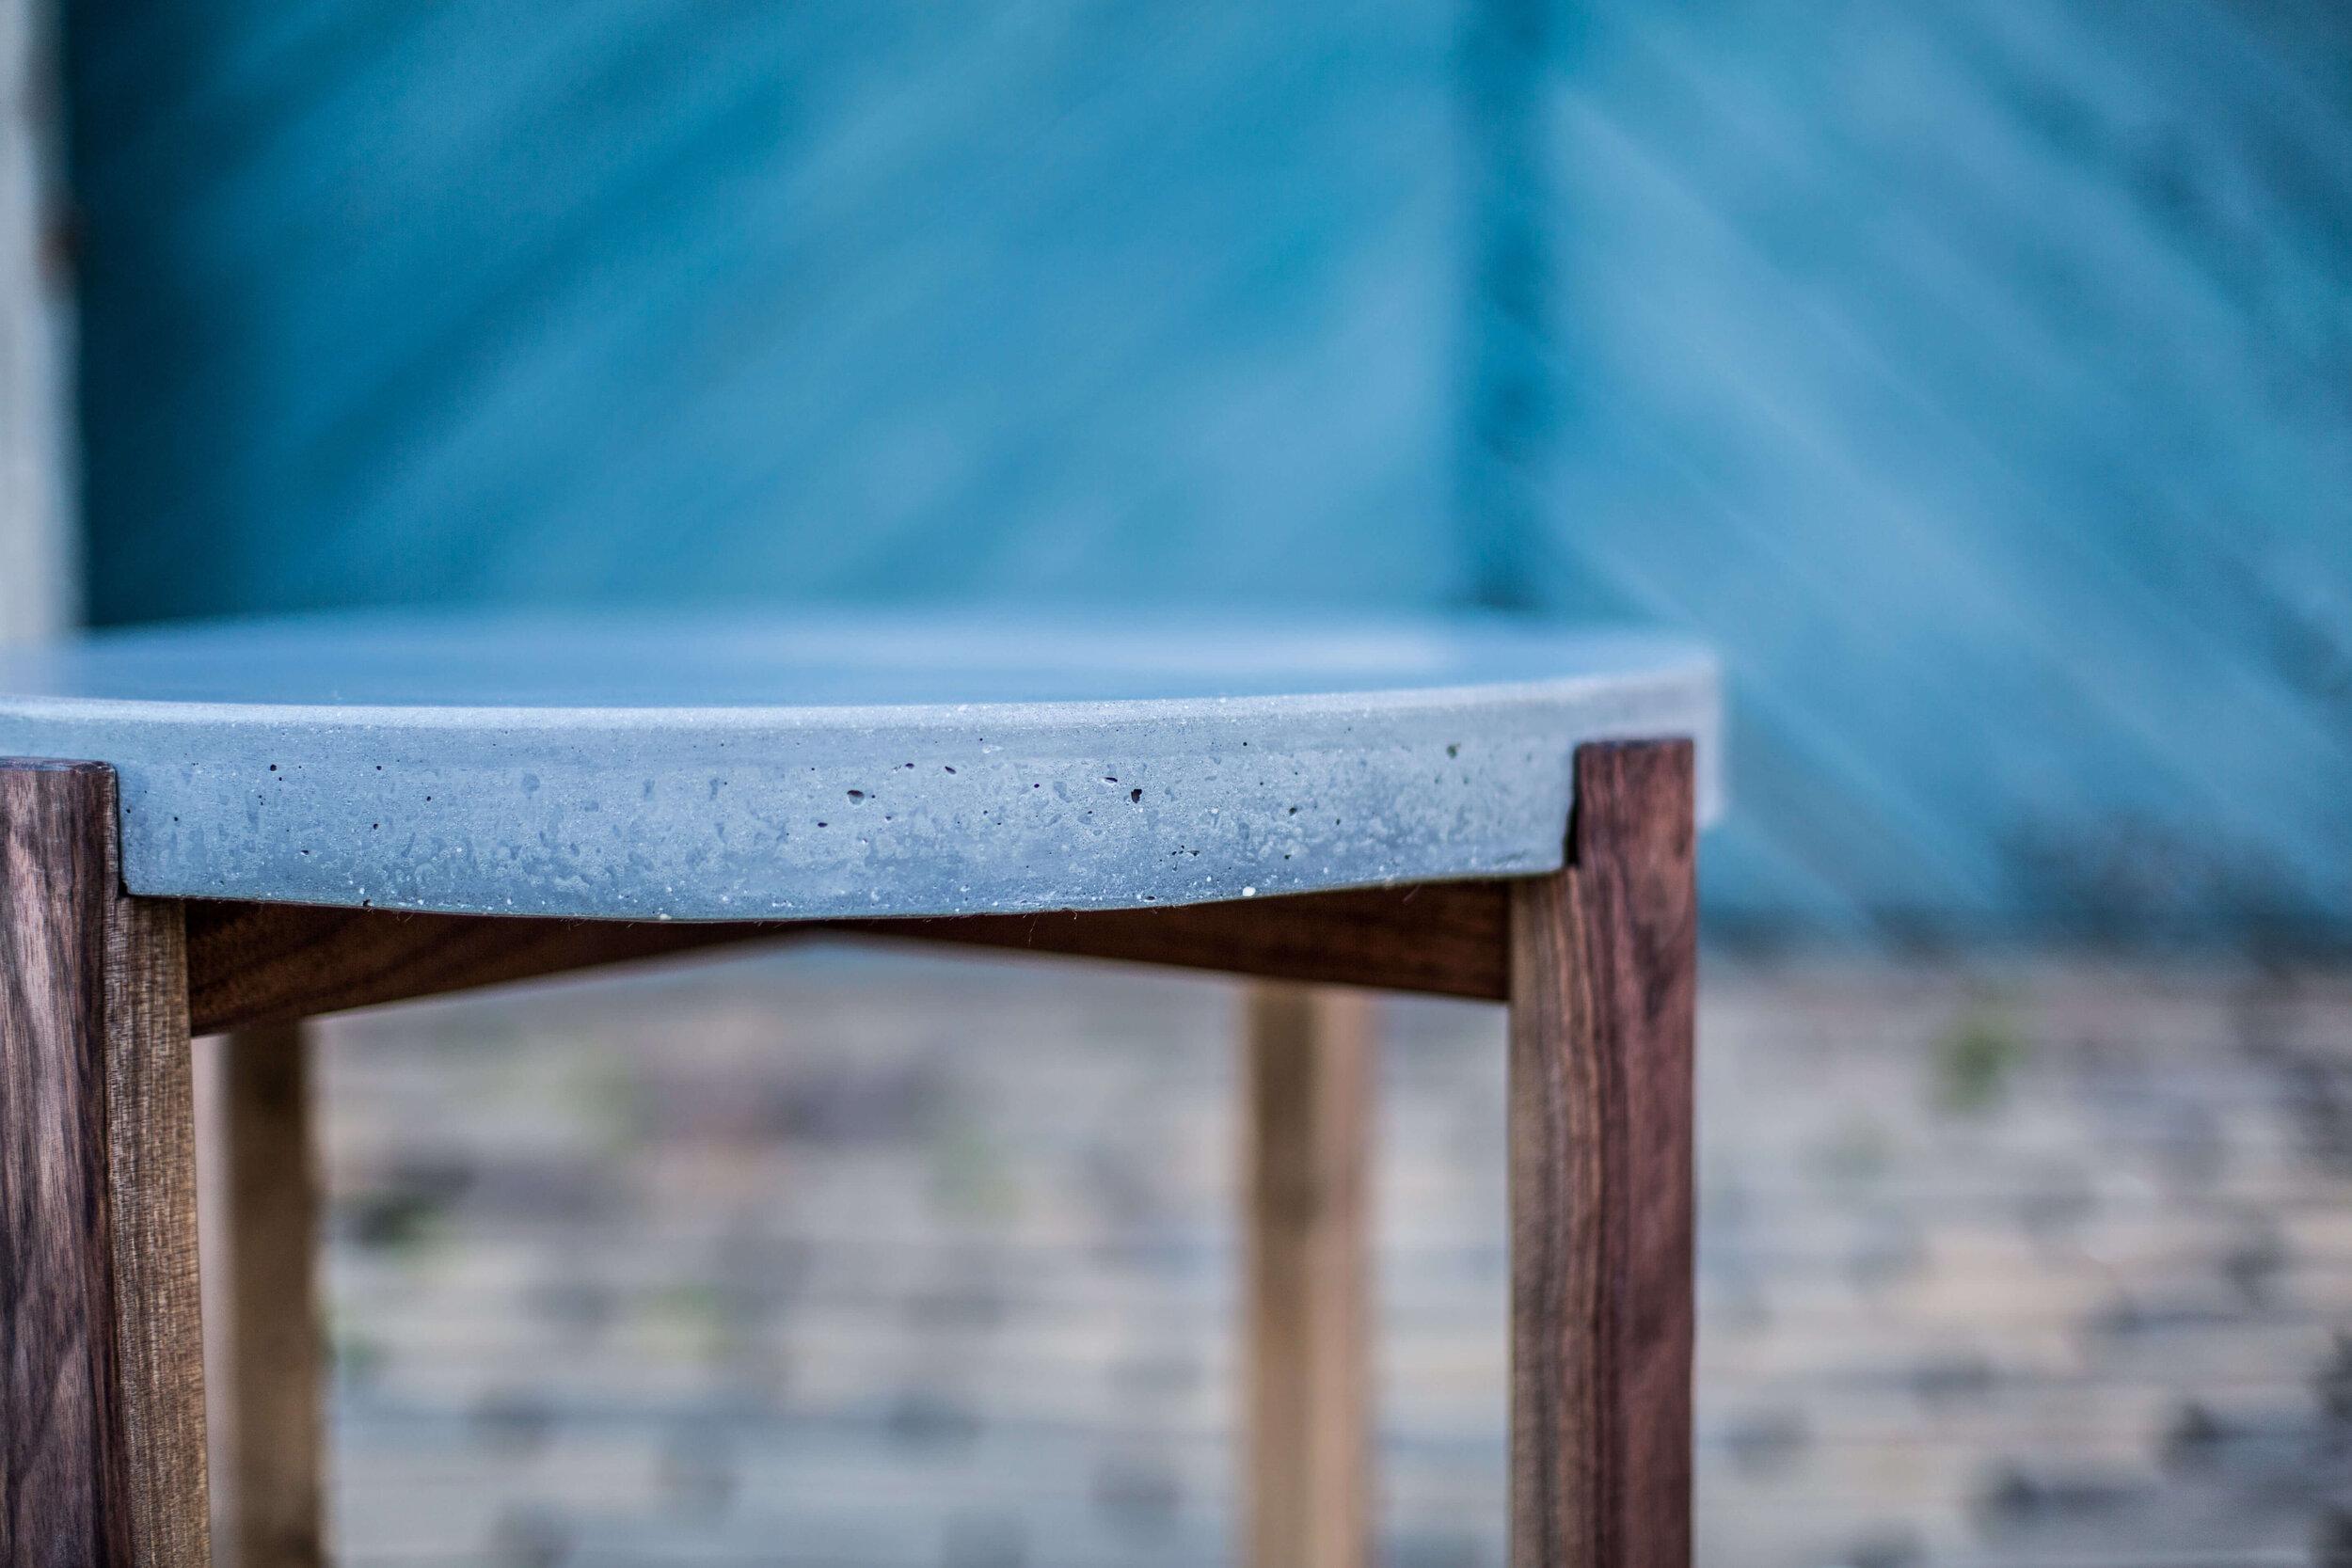 Alicia_Dietz_Modern_Concrete_Furniture_Carved_Wood_End_Table_Sofa_Table_Richmond_VA_9